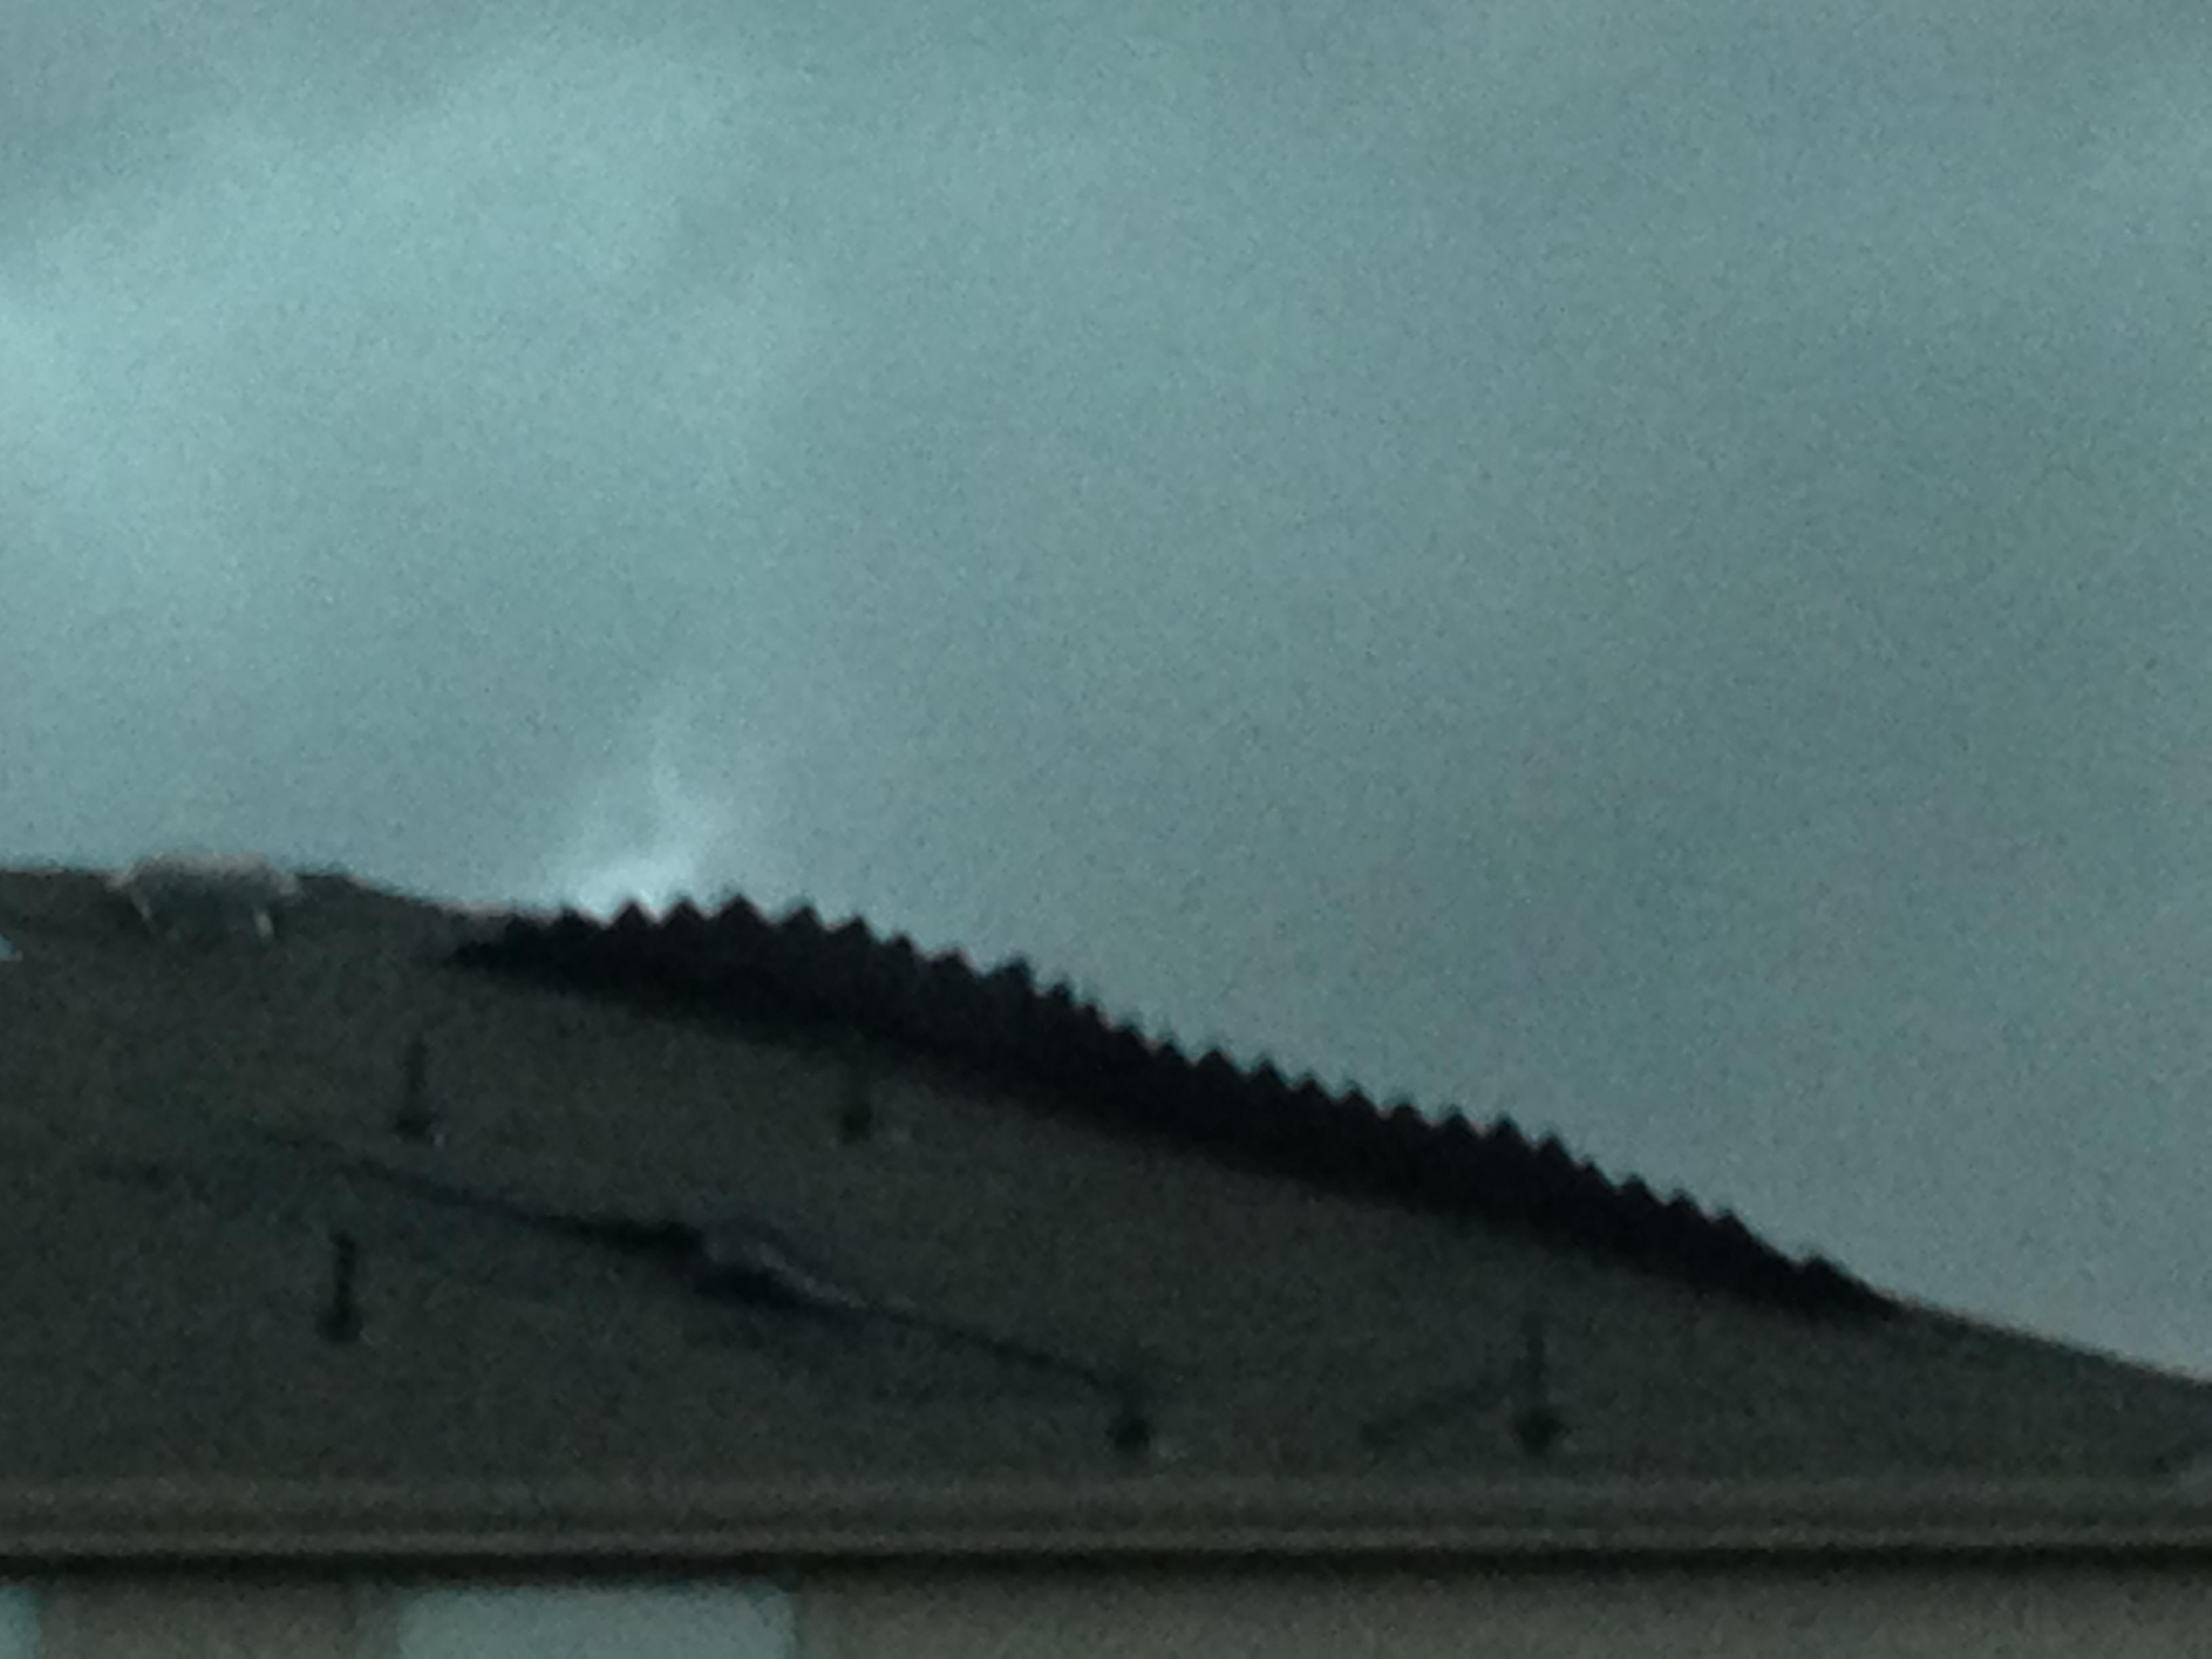 Roof Zippering